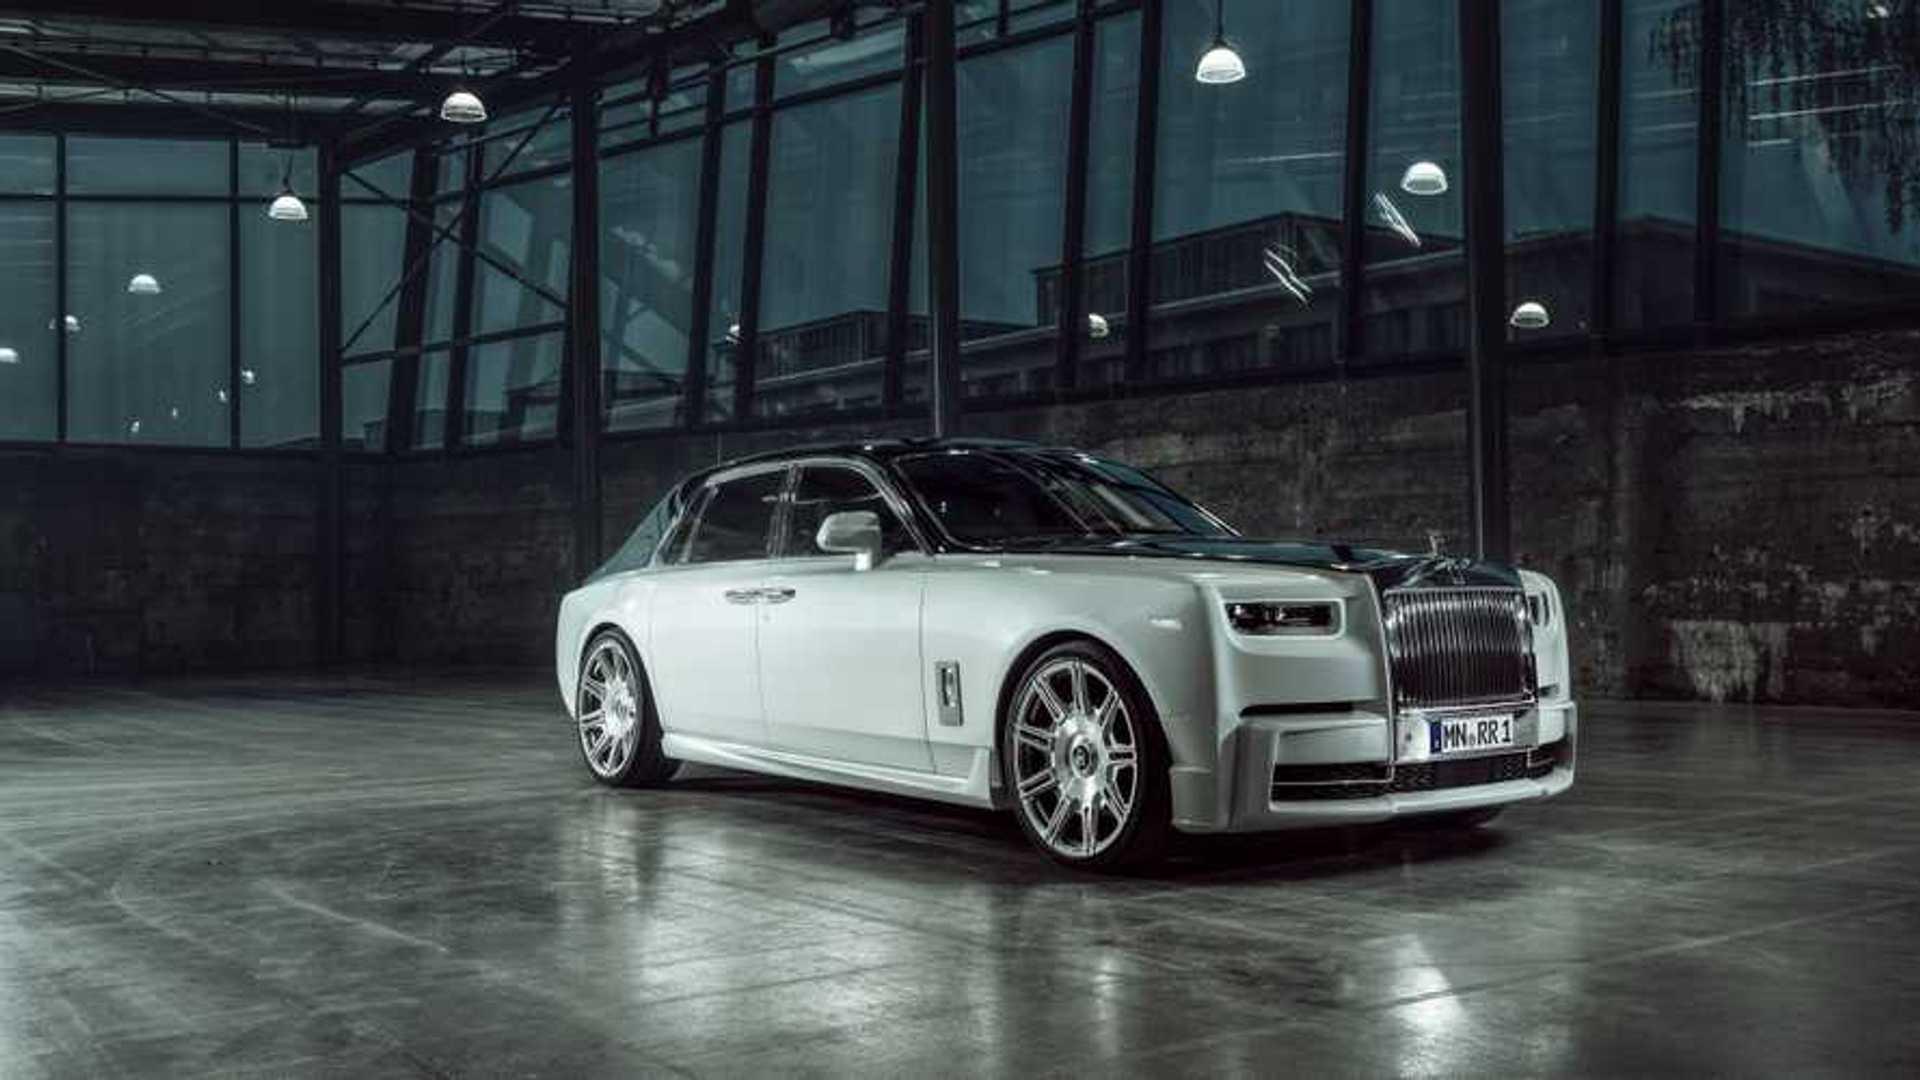 2020 Rolls Royce Phantoms Research New